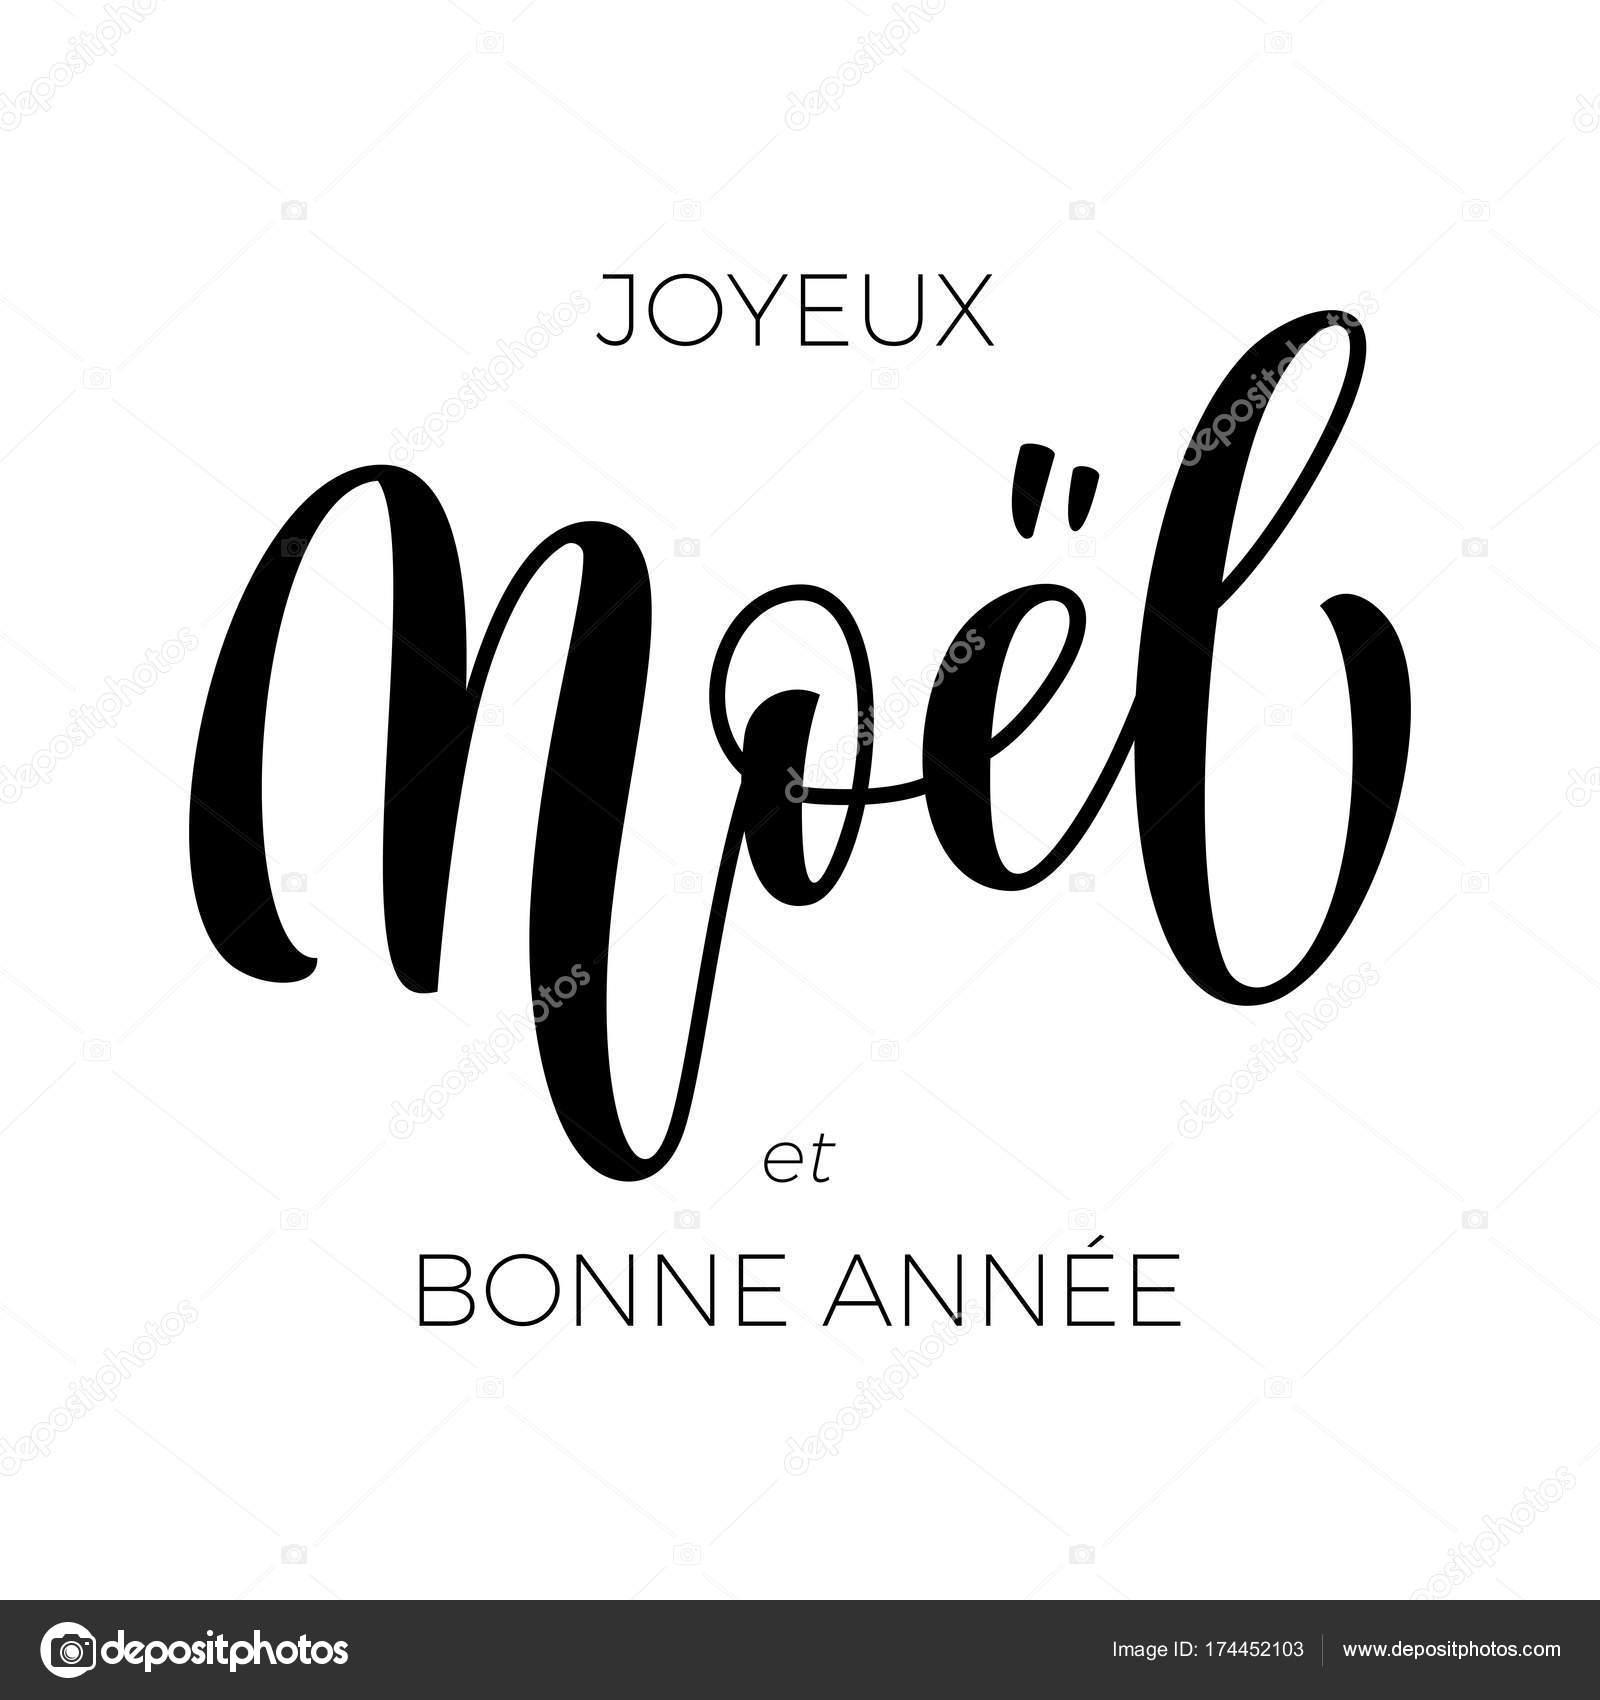 Auguri Di Buon Natale E Felice Anno Nuovo In Francese.Joyeux Noel Et Bonne Annee Francese Buon Natale E Felice